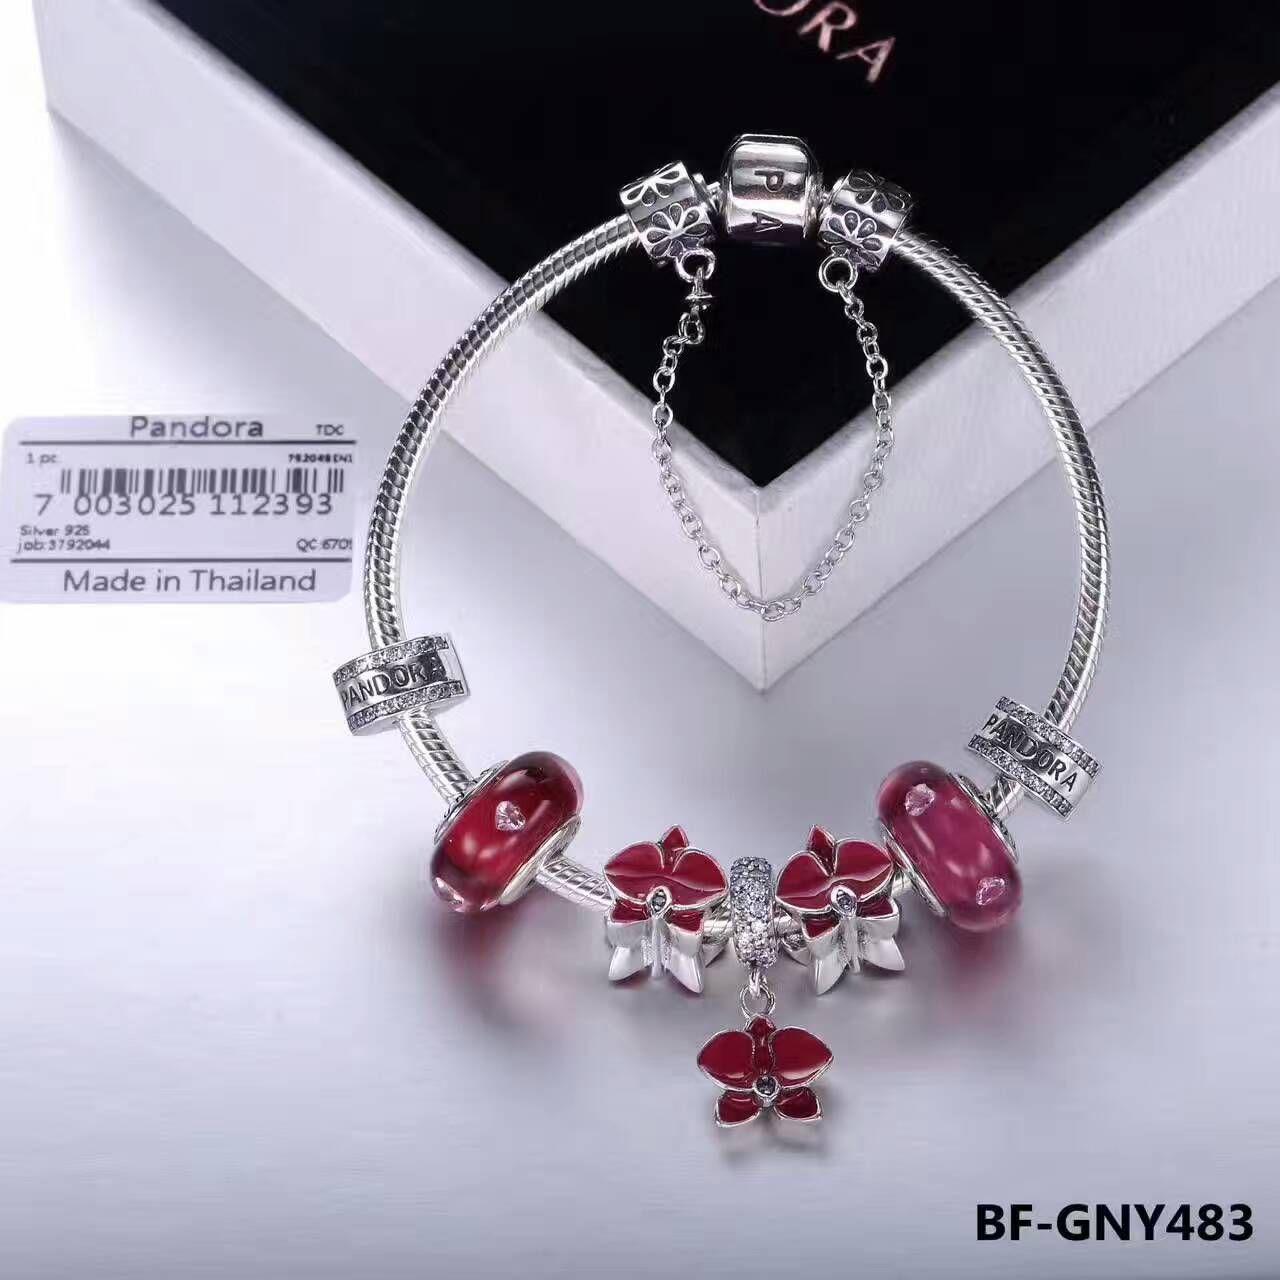 Read Completed Pandora Bracelets Reviews And Customer Ratings On Girls Bracelet Kit Girl Catche Bracelets Women Fashion Pandora Jewelry Pandora Bracelet Charms